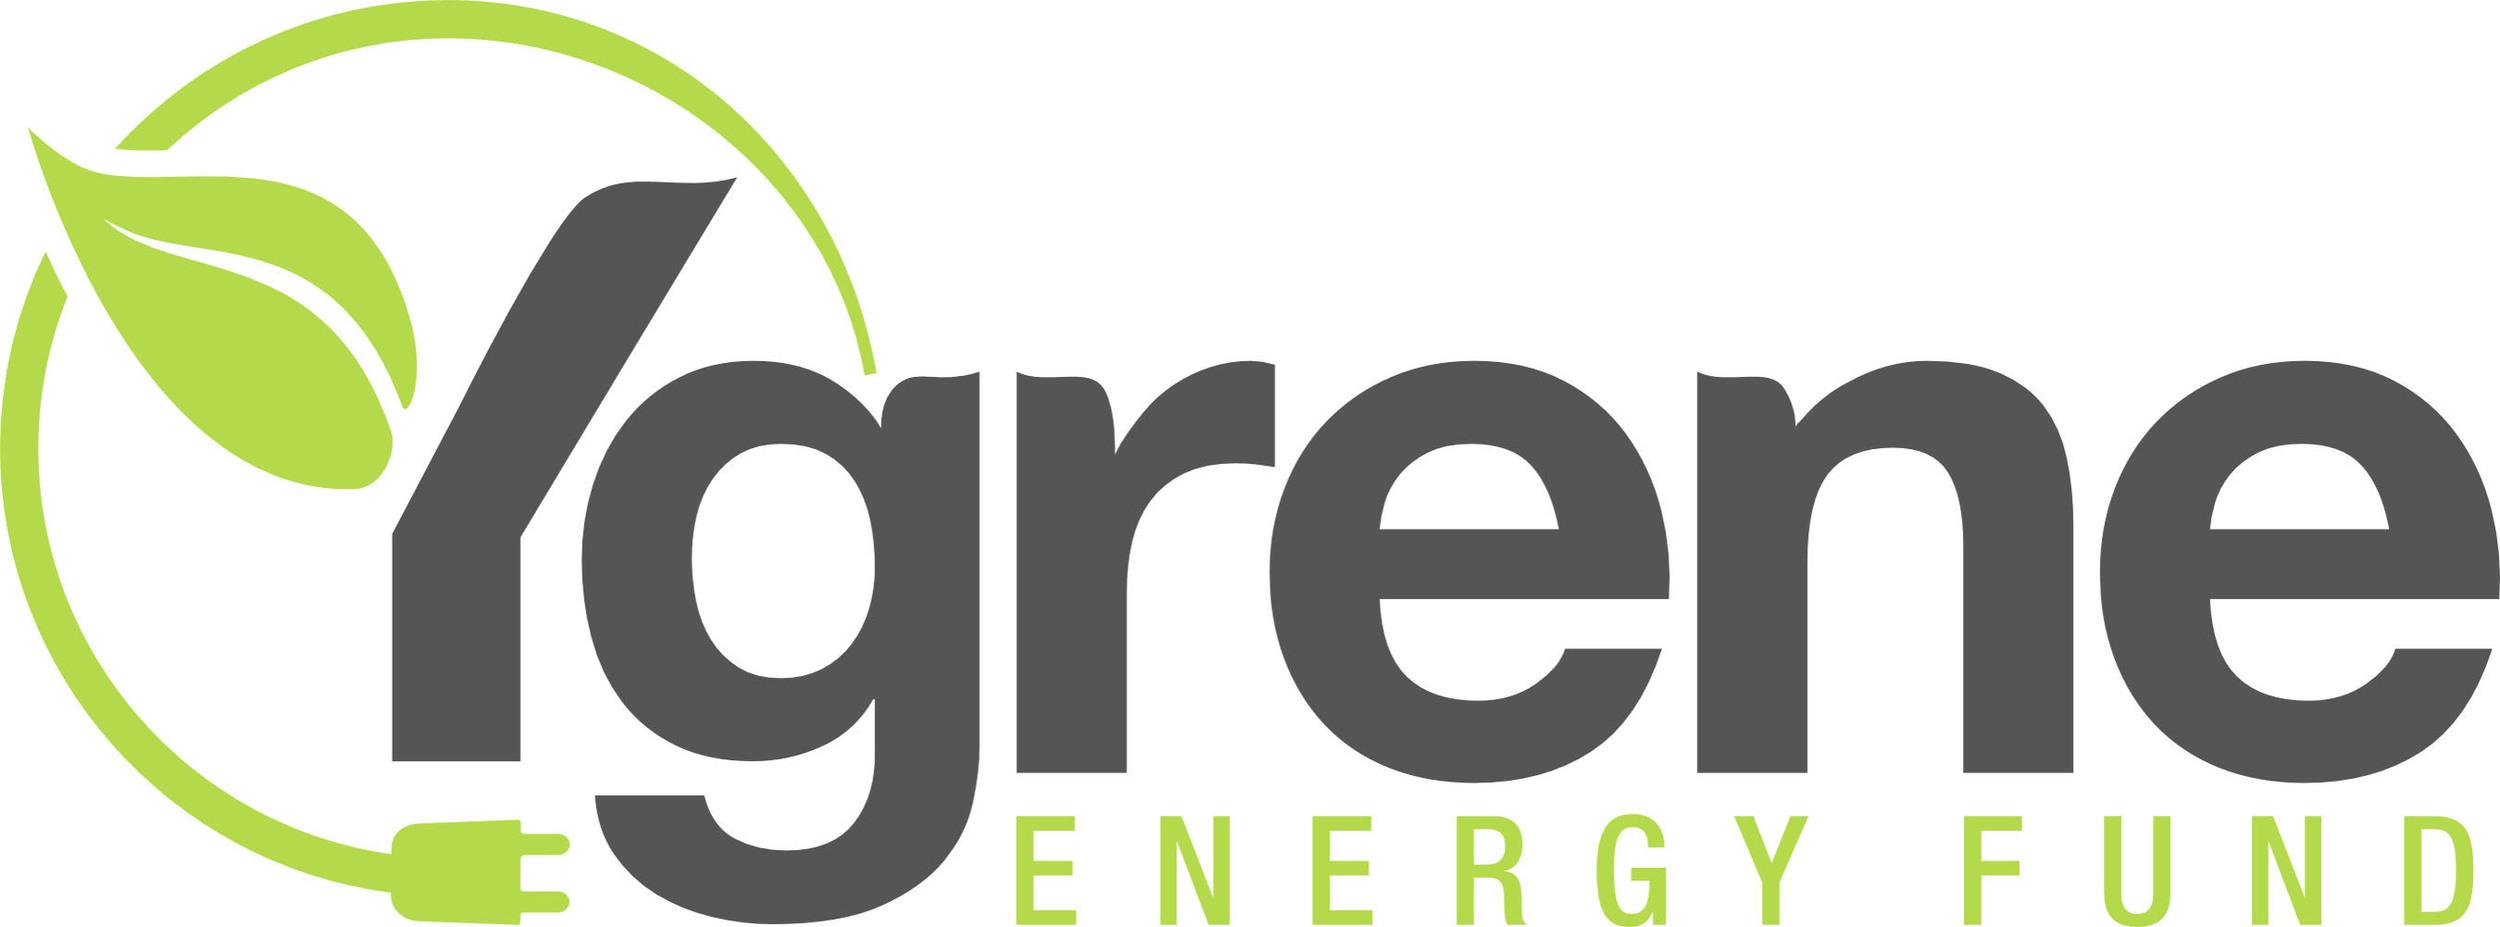 Ygrene Energy Fund